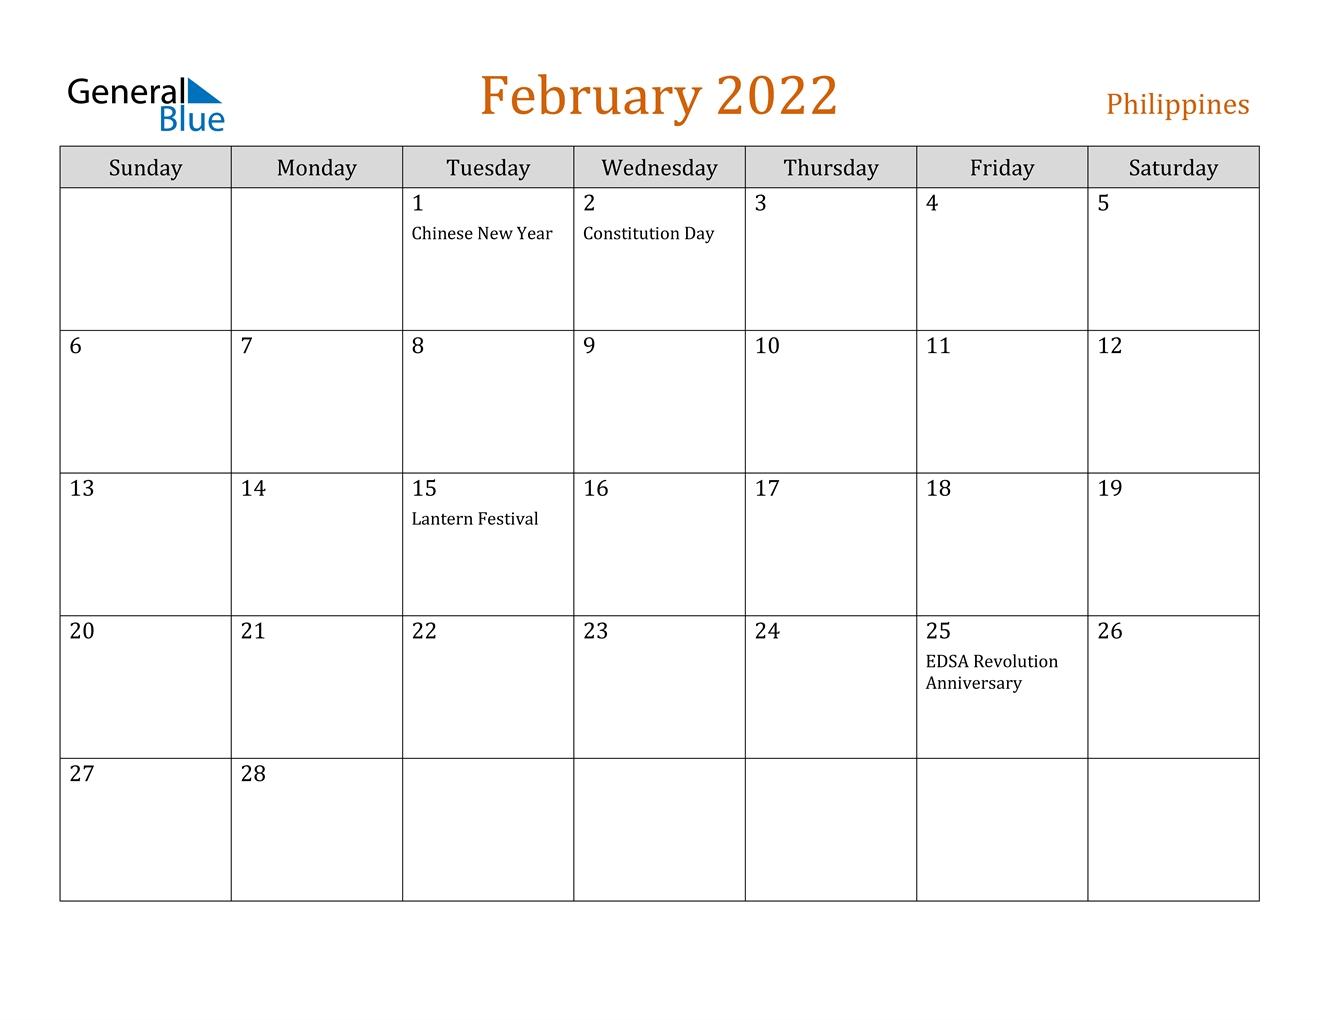 February 2022 Calendar - Philippines